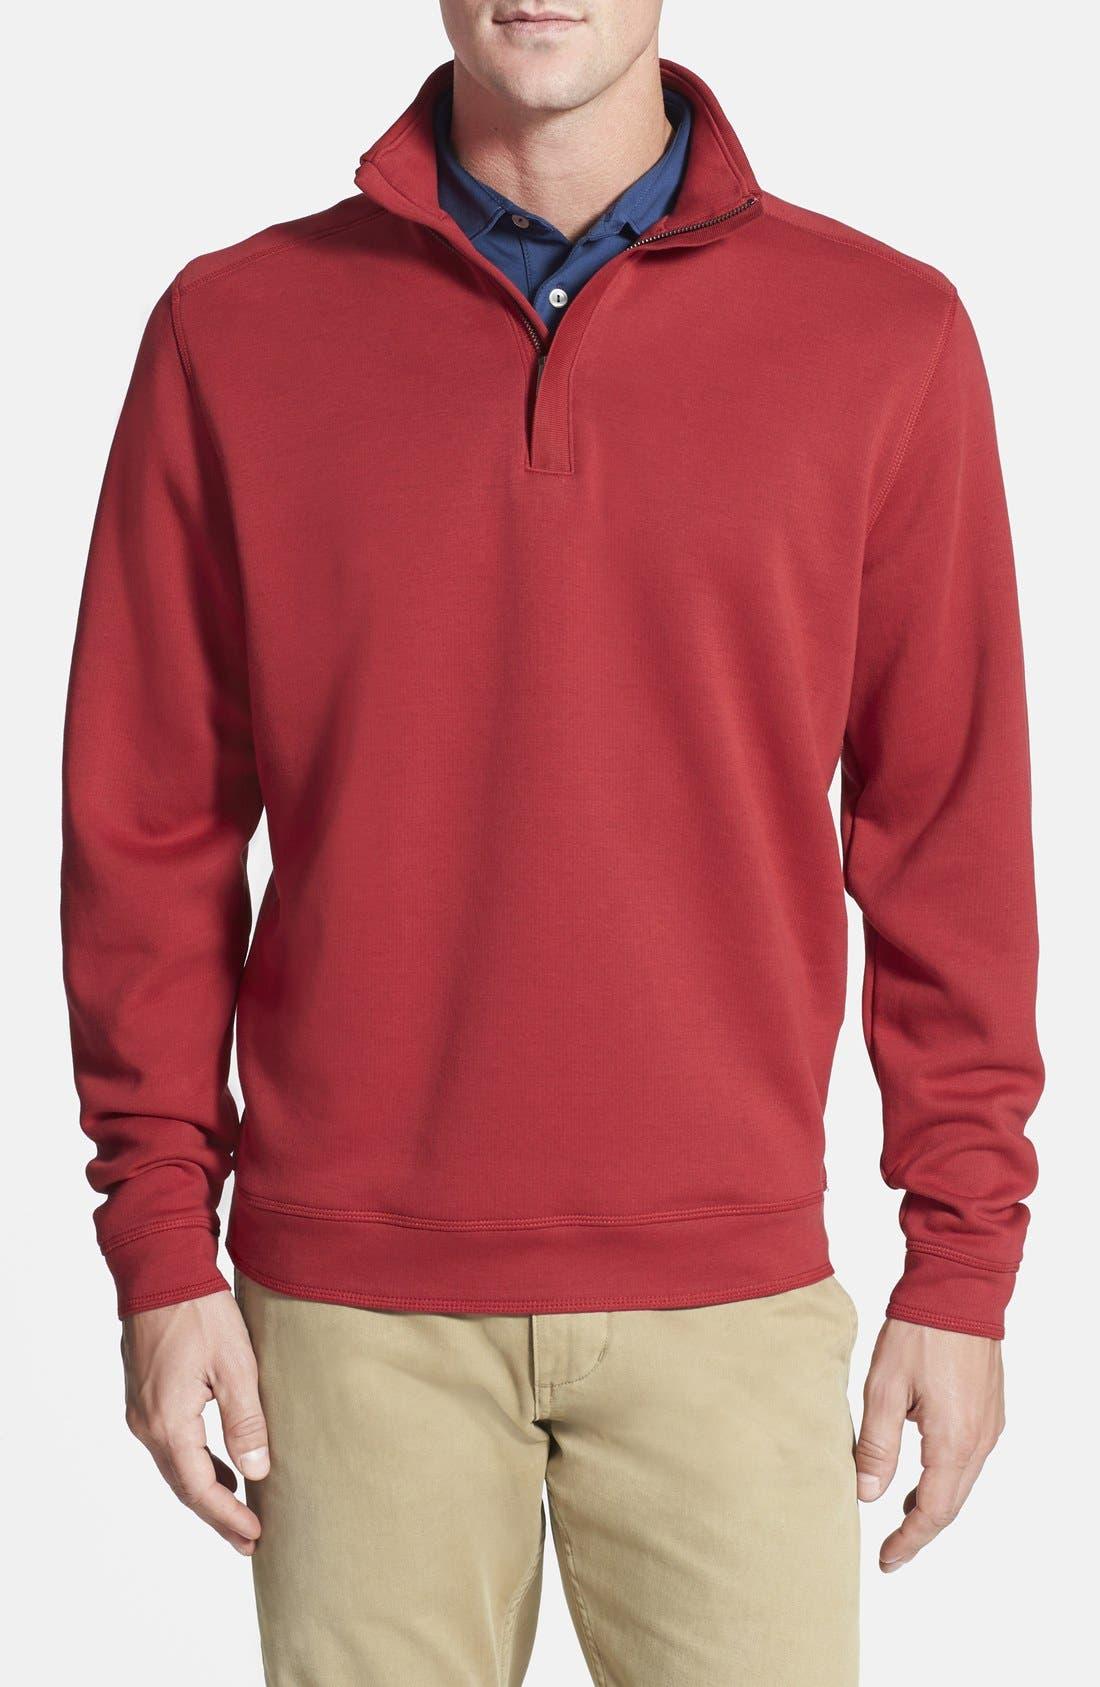 Cutter & Buck 'Decatur' Pima Cotton Pullover (Big & Tall)